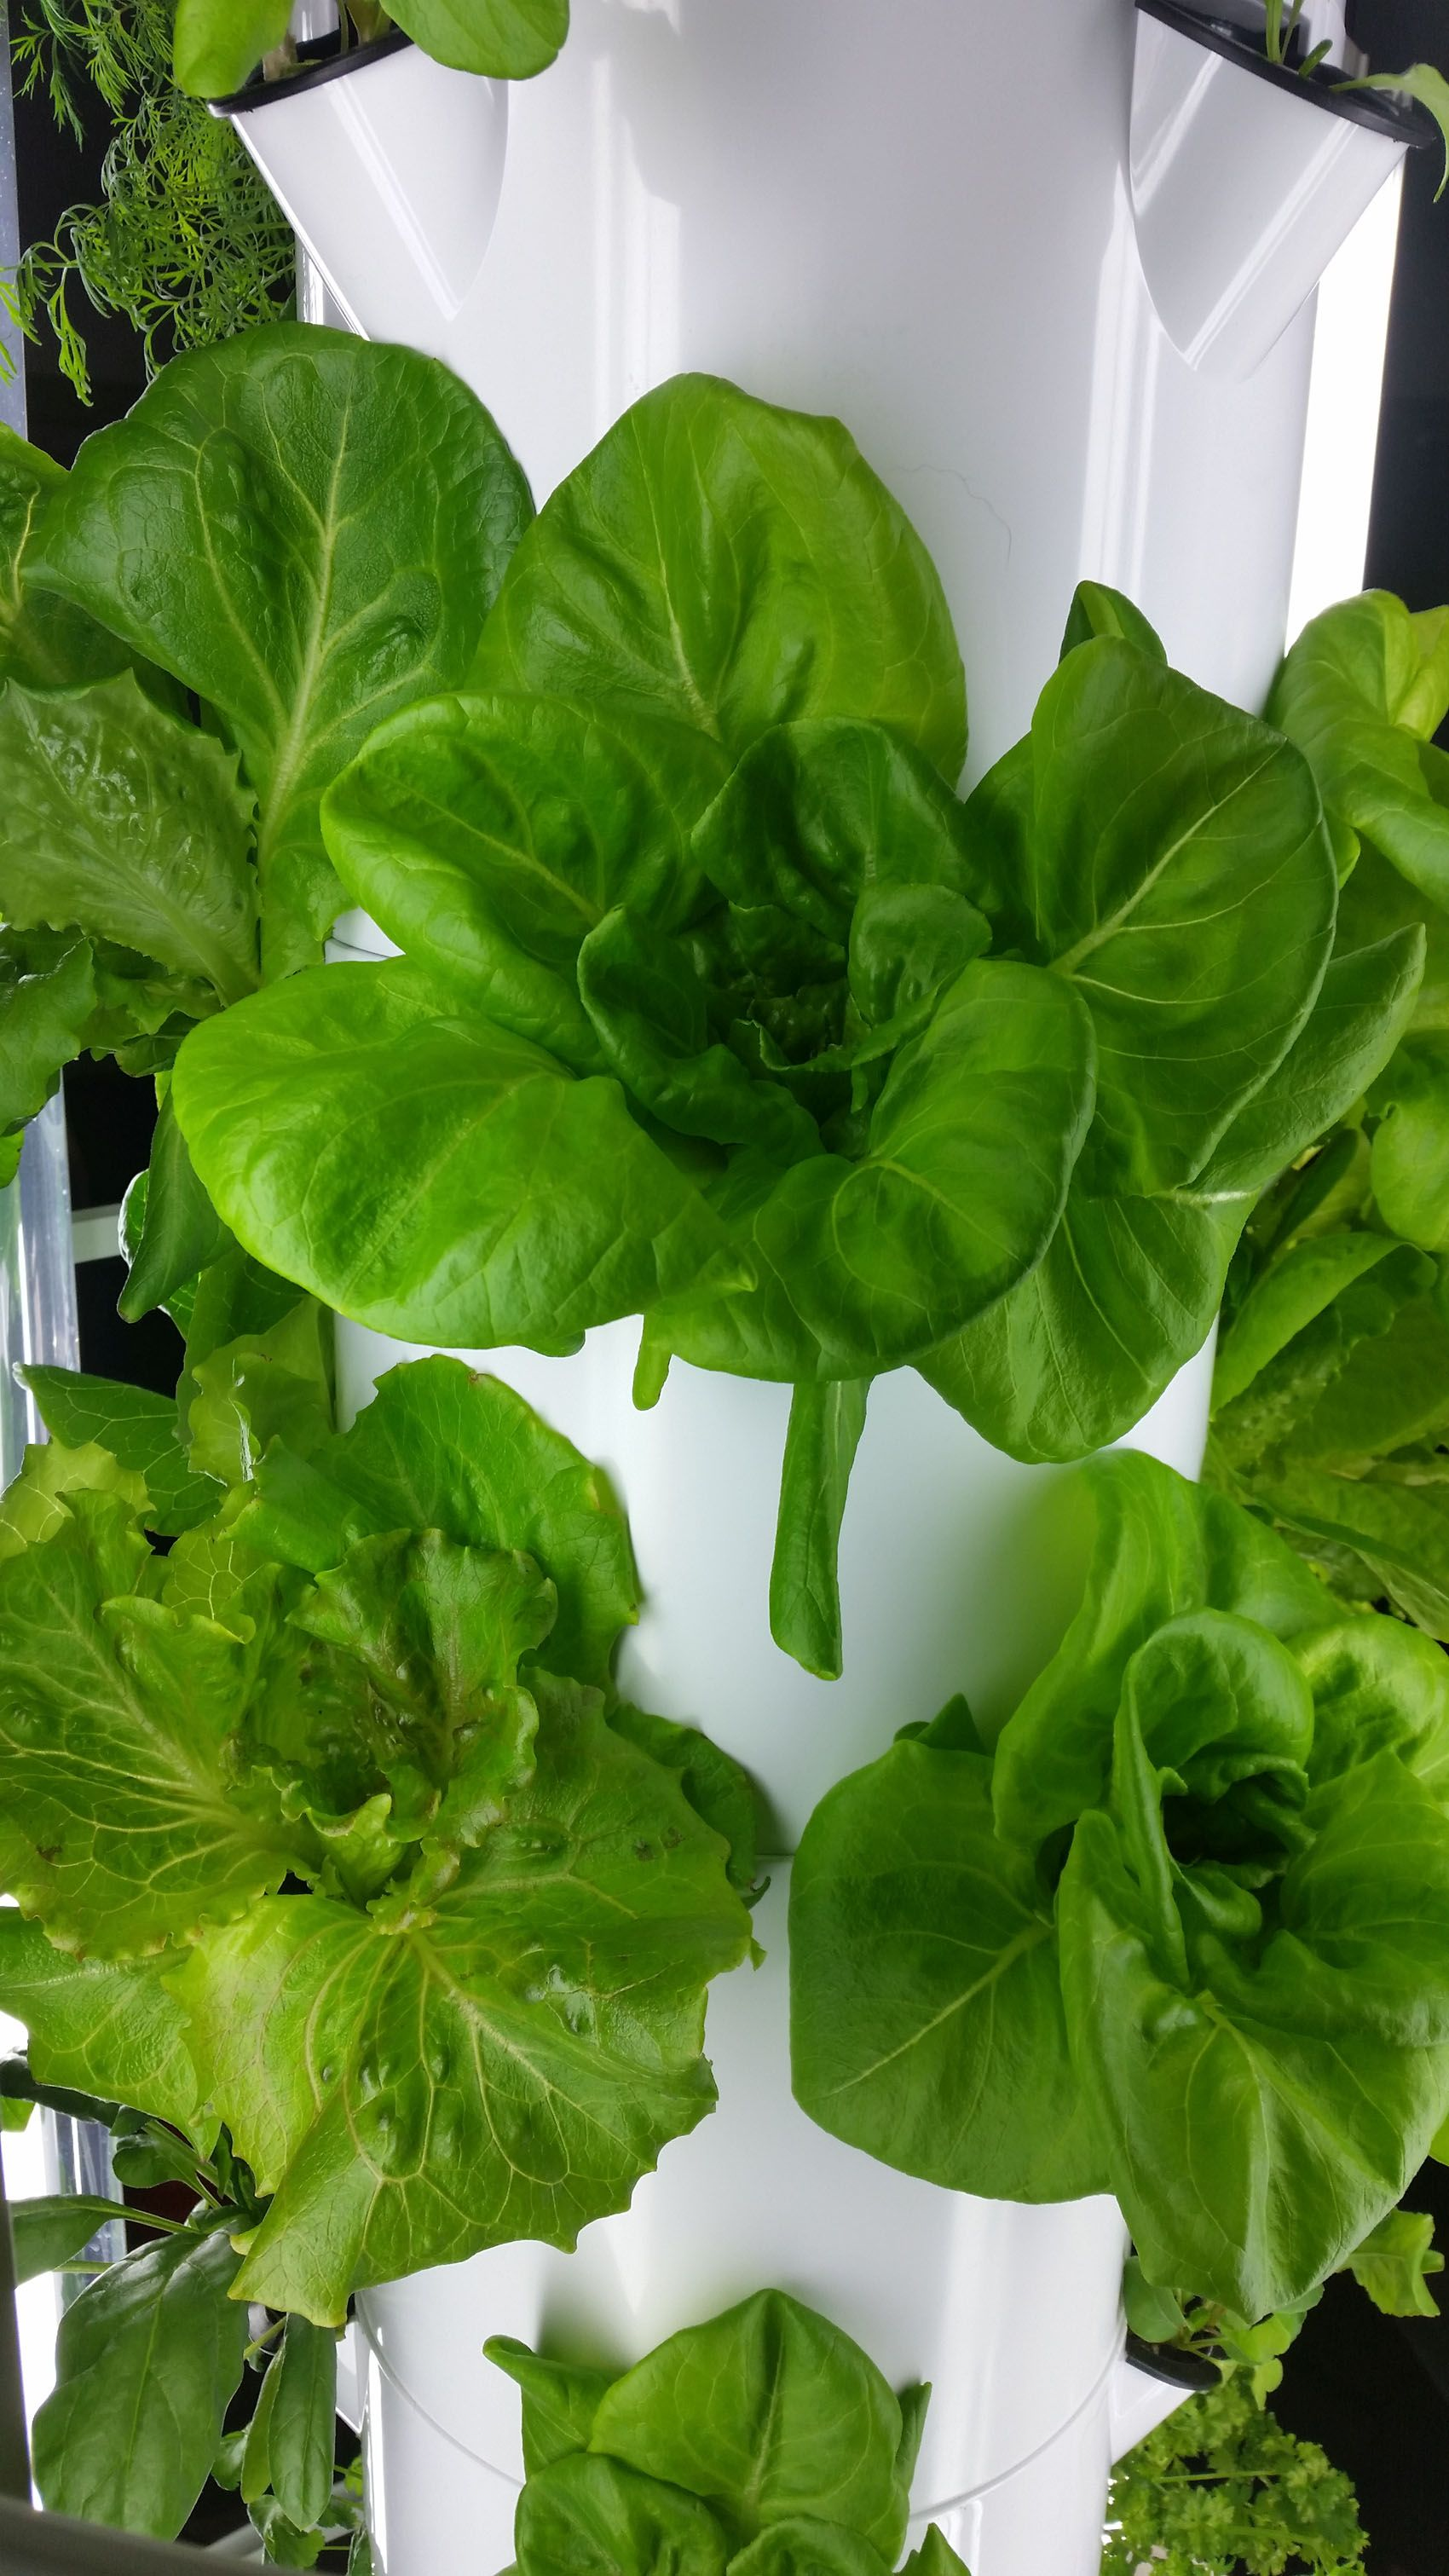 Tower Garden Bibb Lettuce Leafy Greens Grown indoors